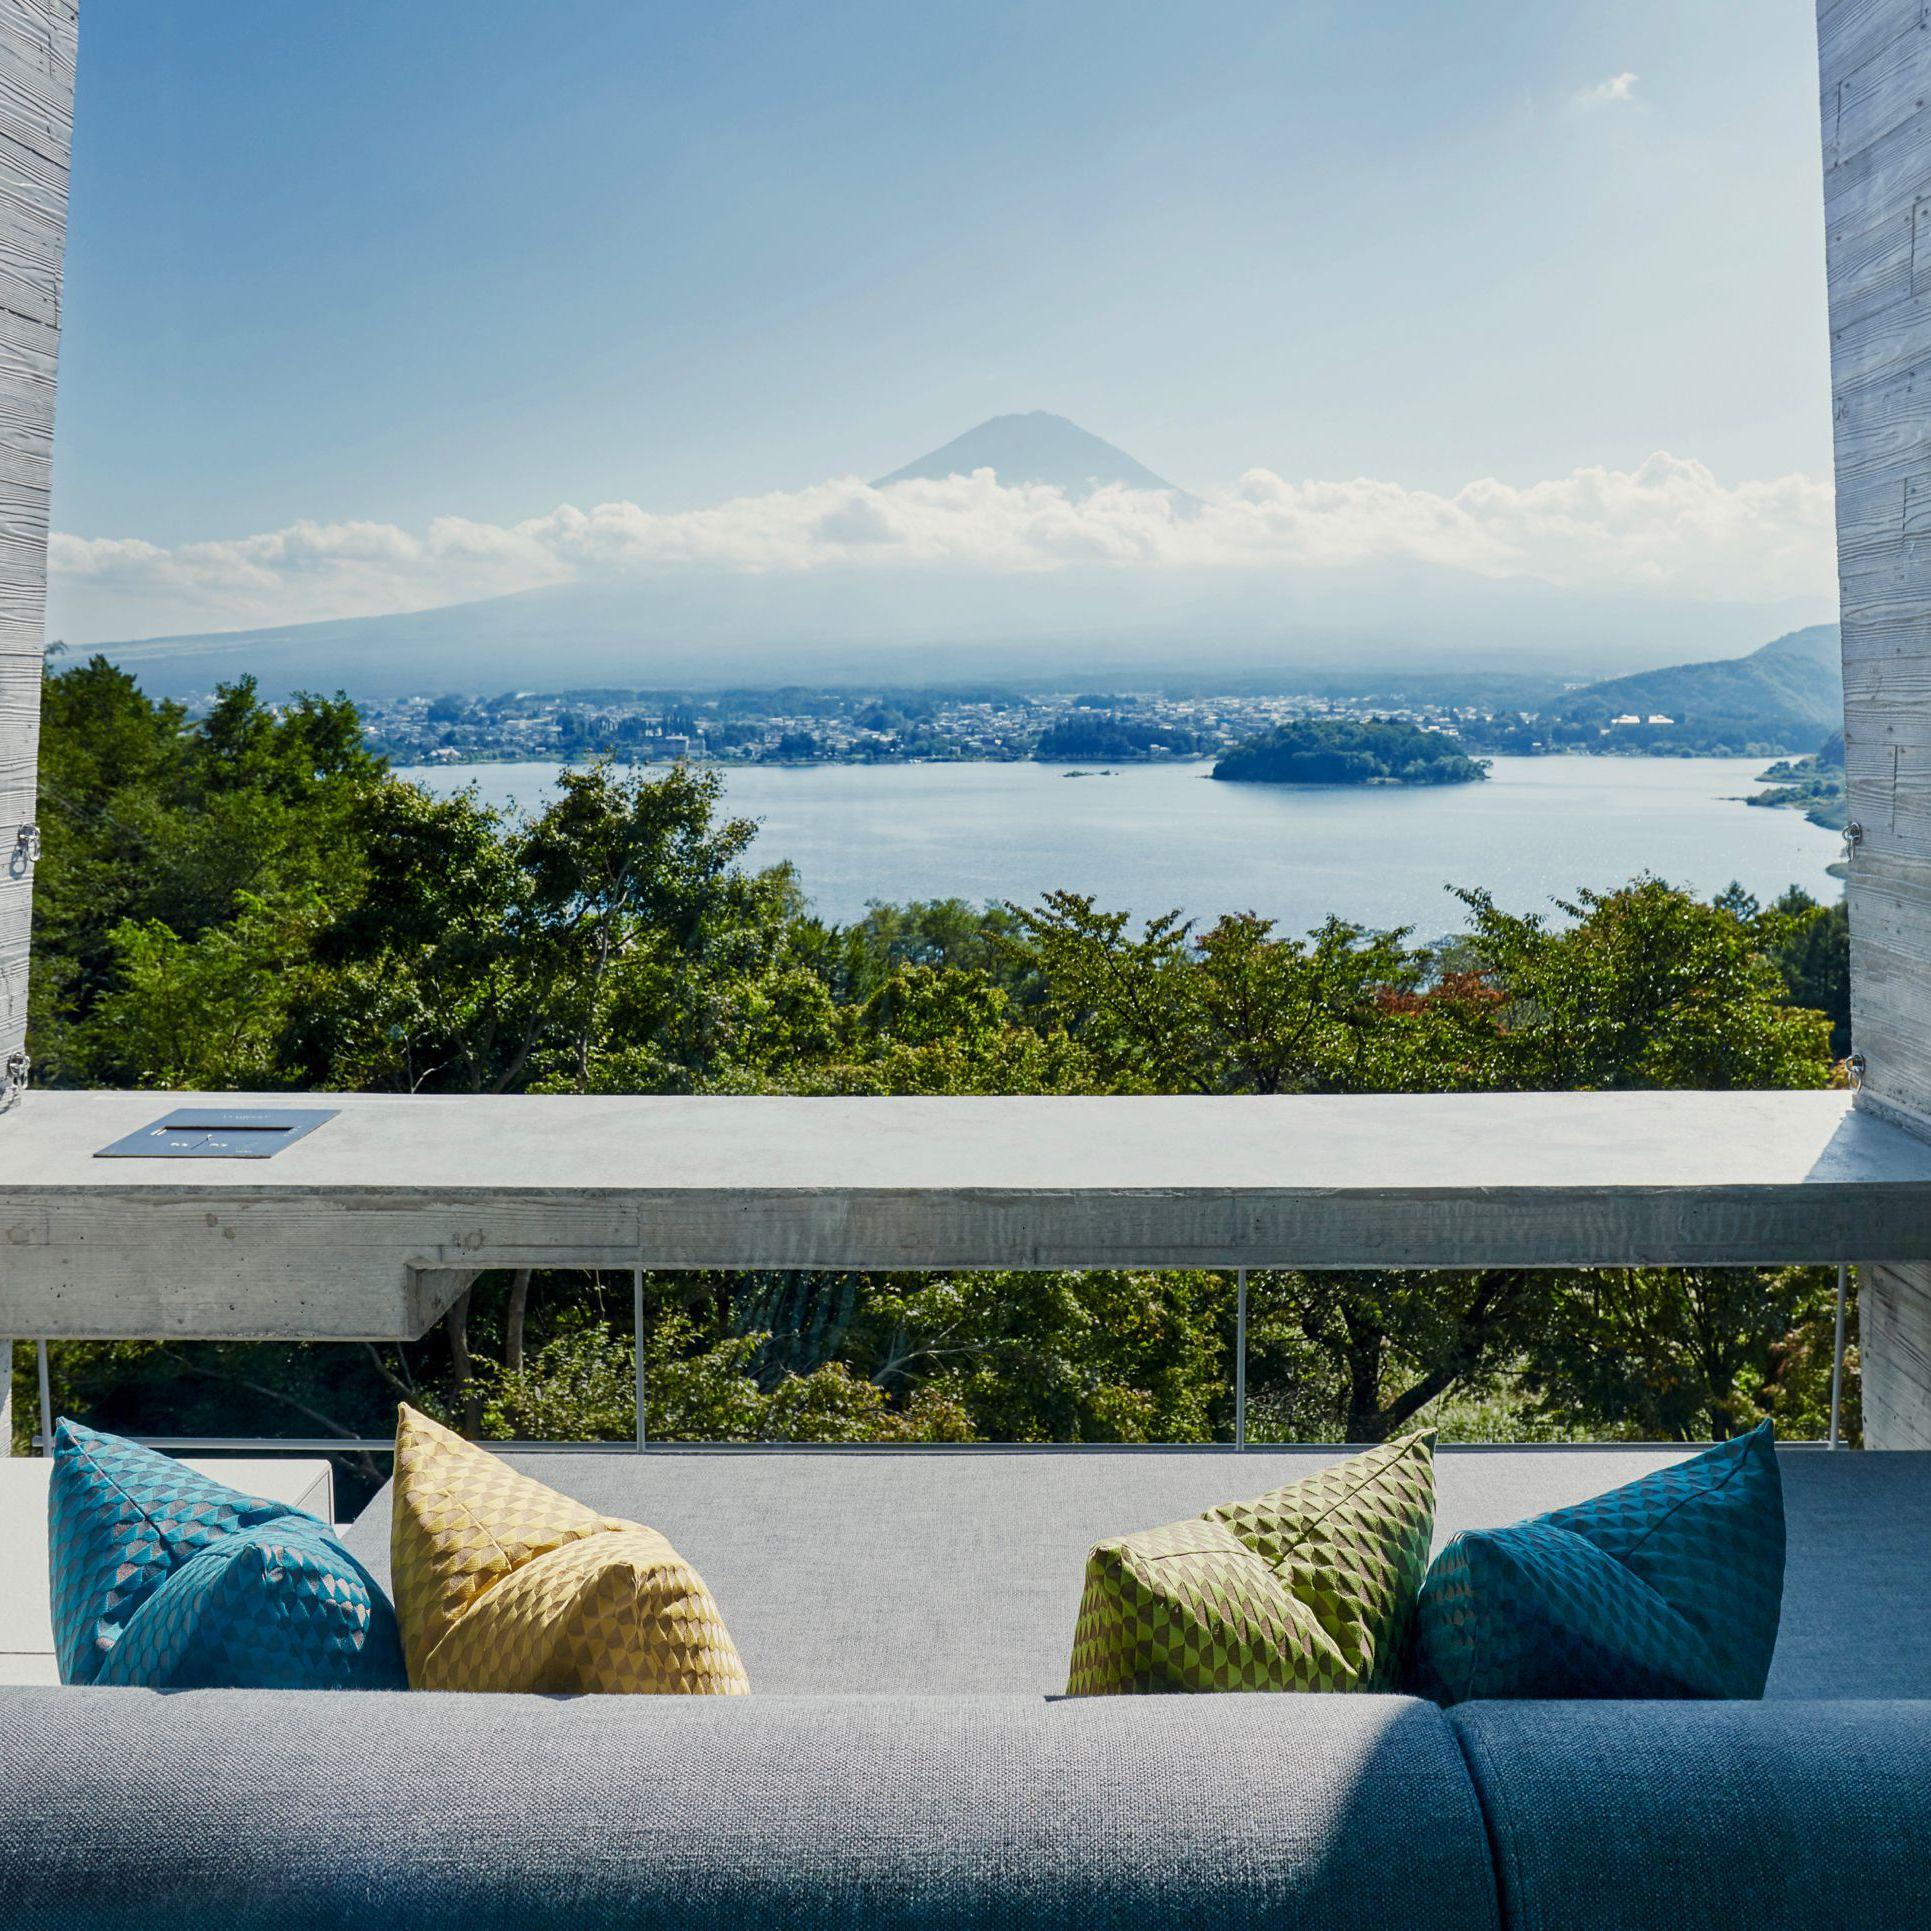 Hoshinoya: Top Boutique Hotels in Design-Obsessed Japan